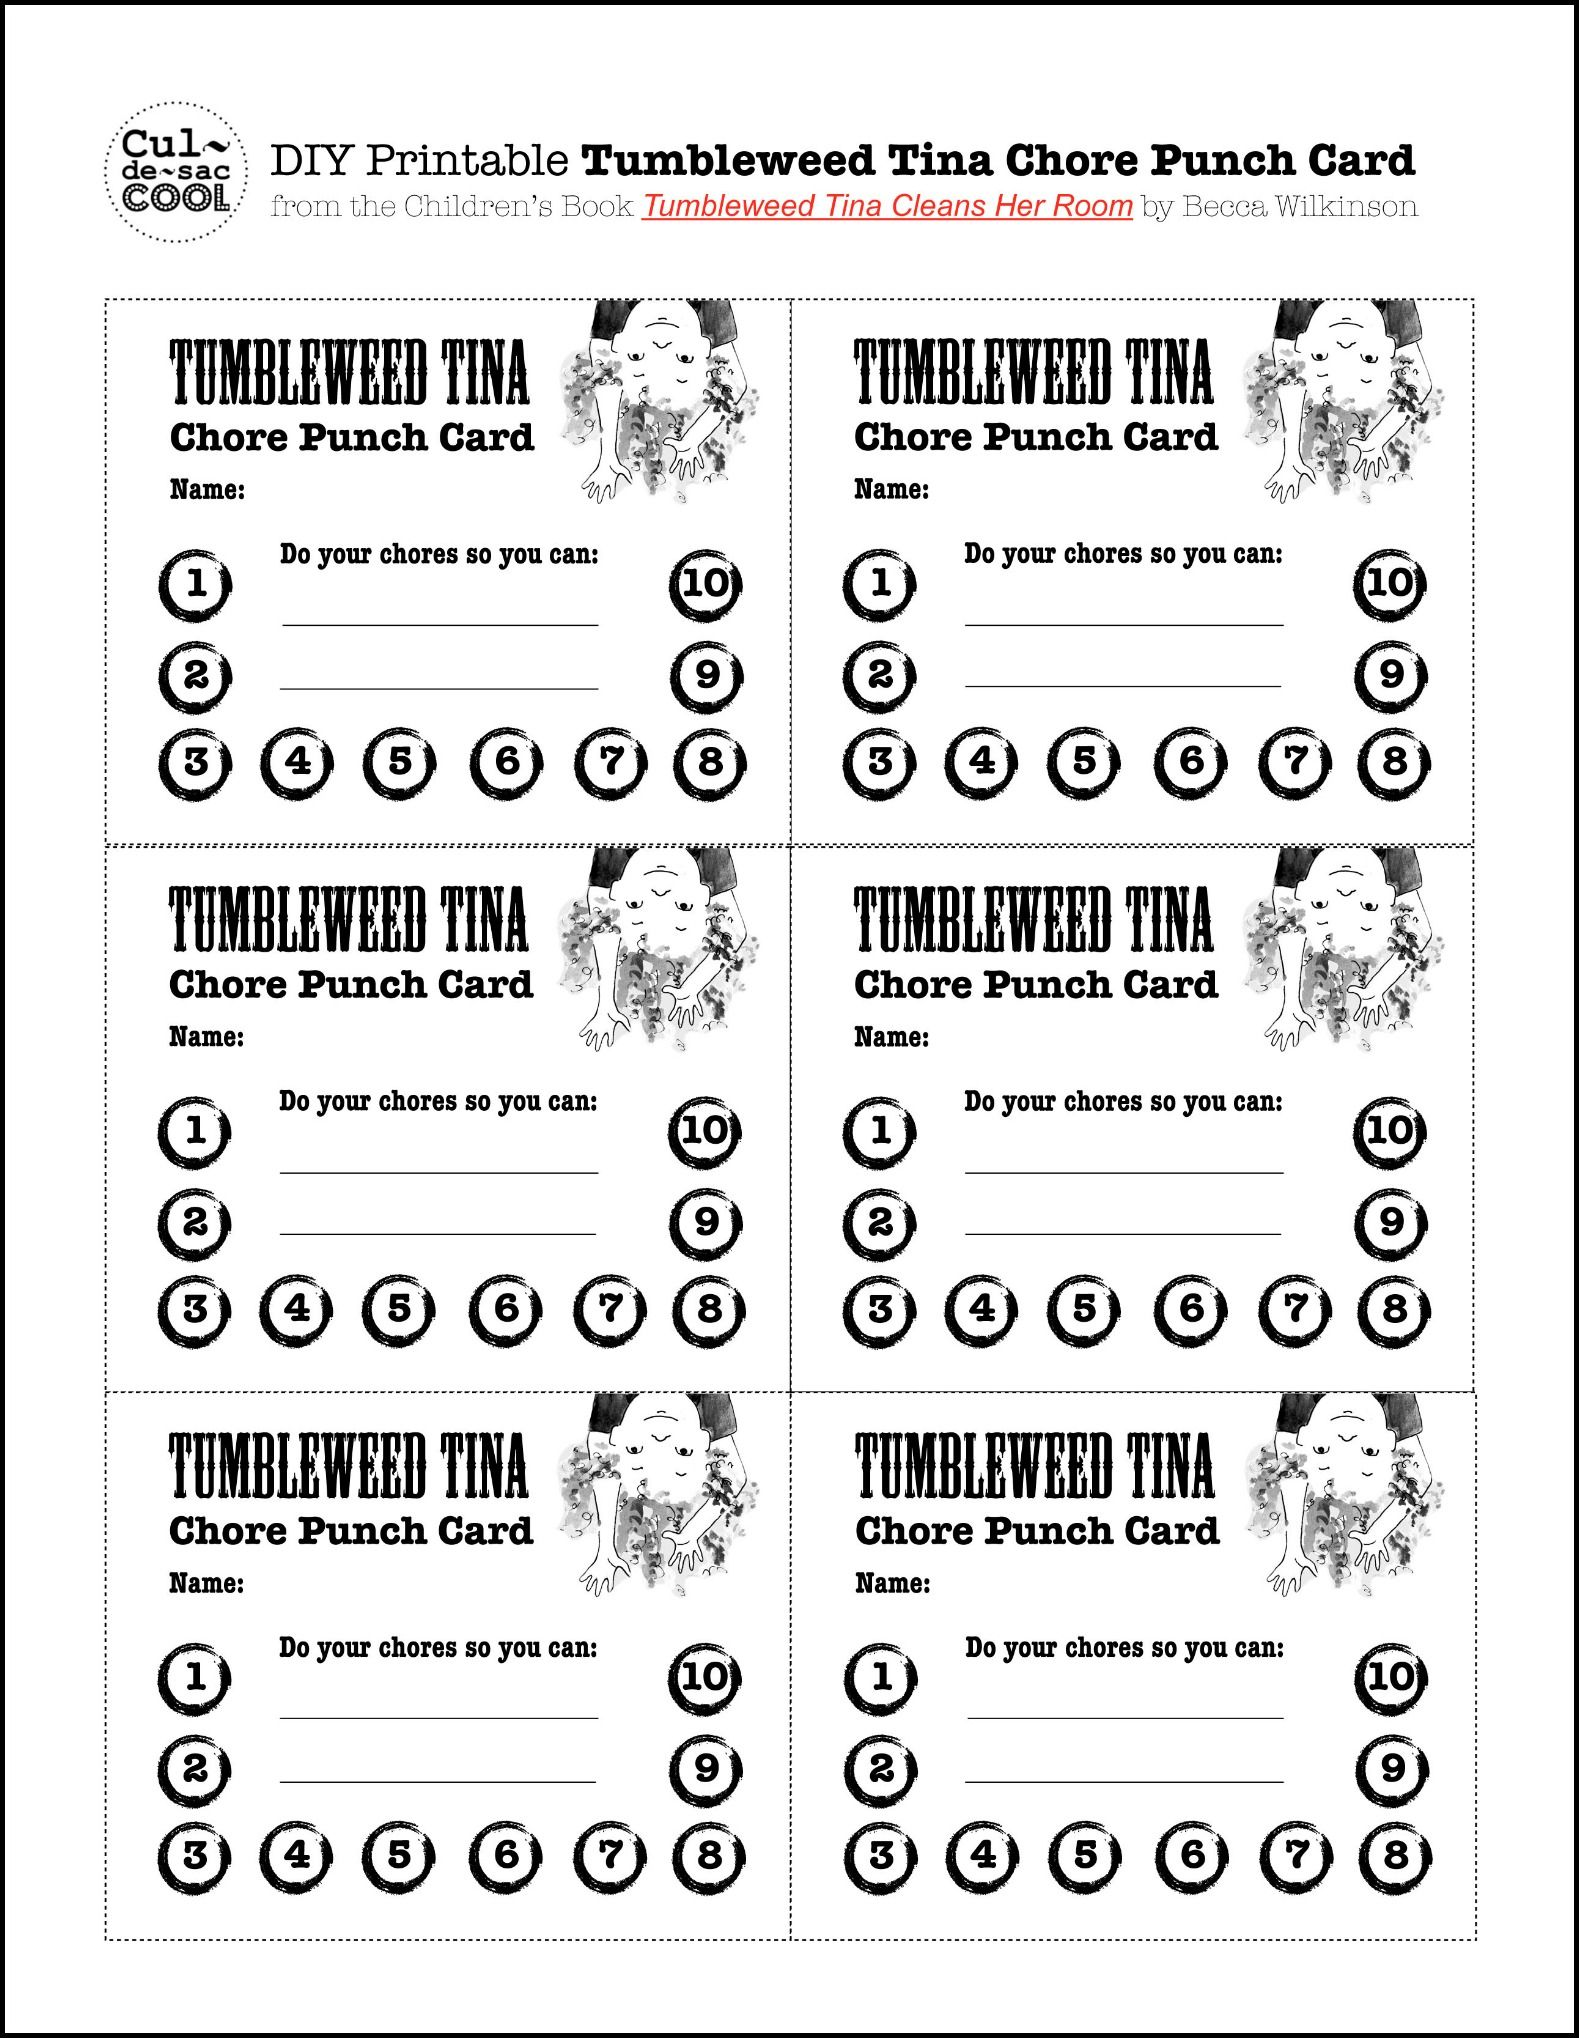 Diy Printable Tumbleweed Tina Chore Punch Card Behavior Punch Cards Punch Cards Card Templates Free